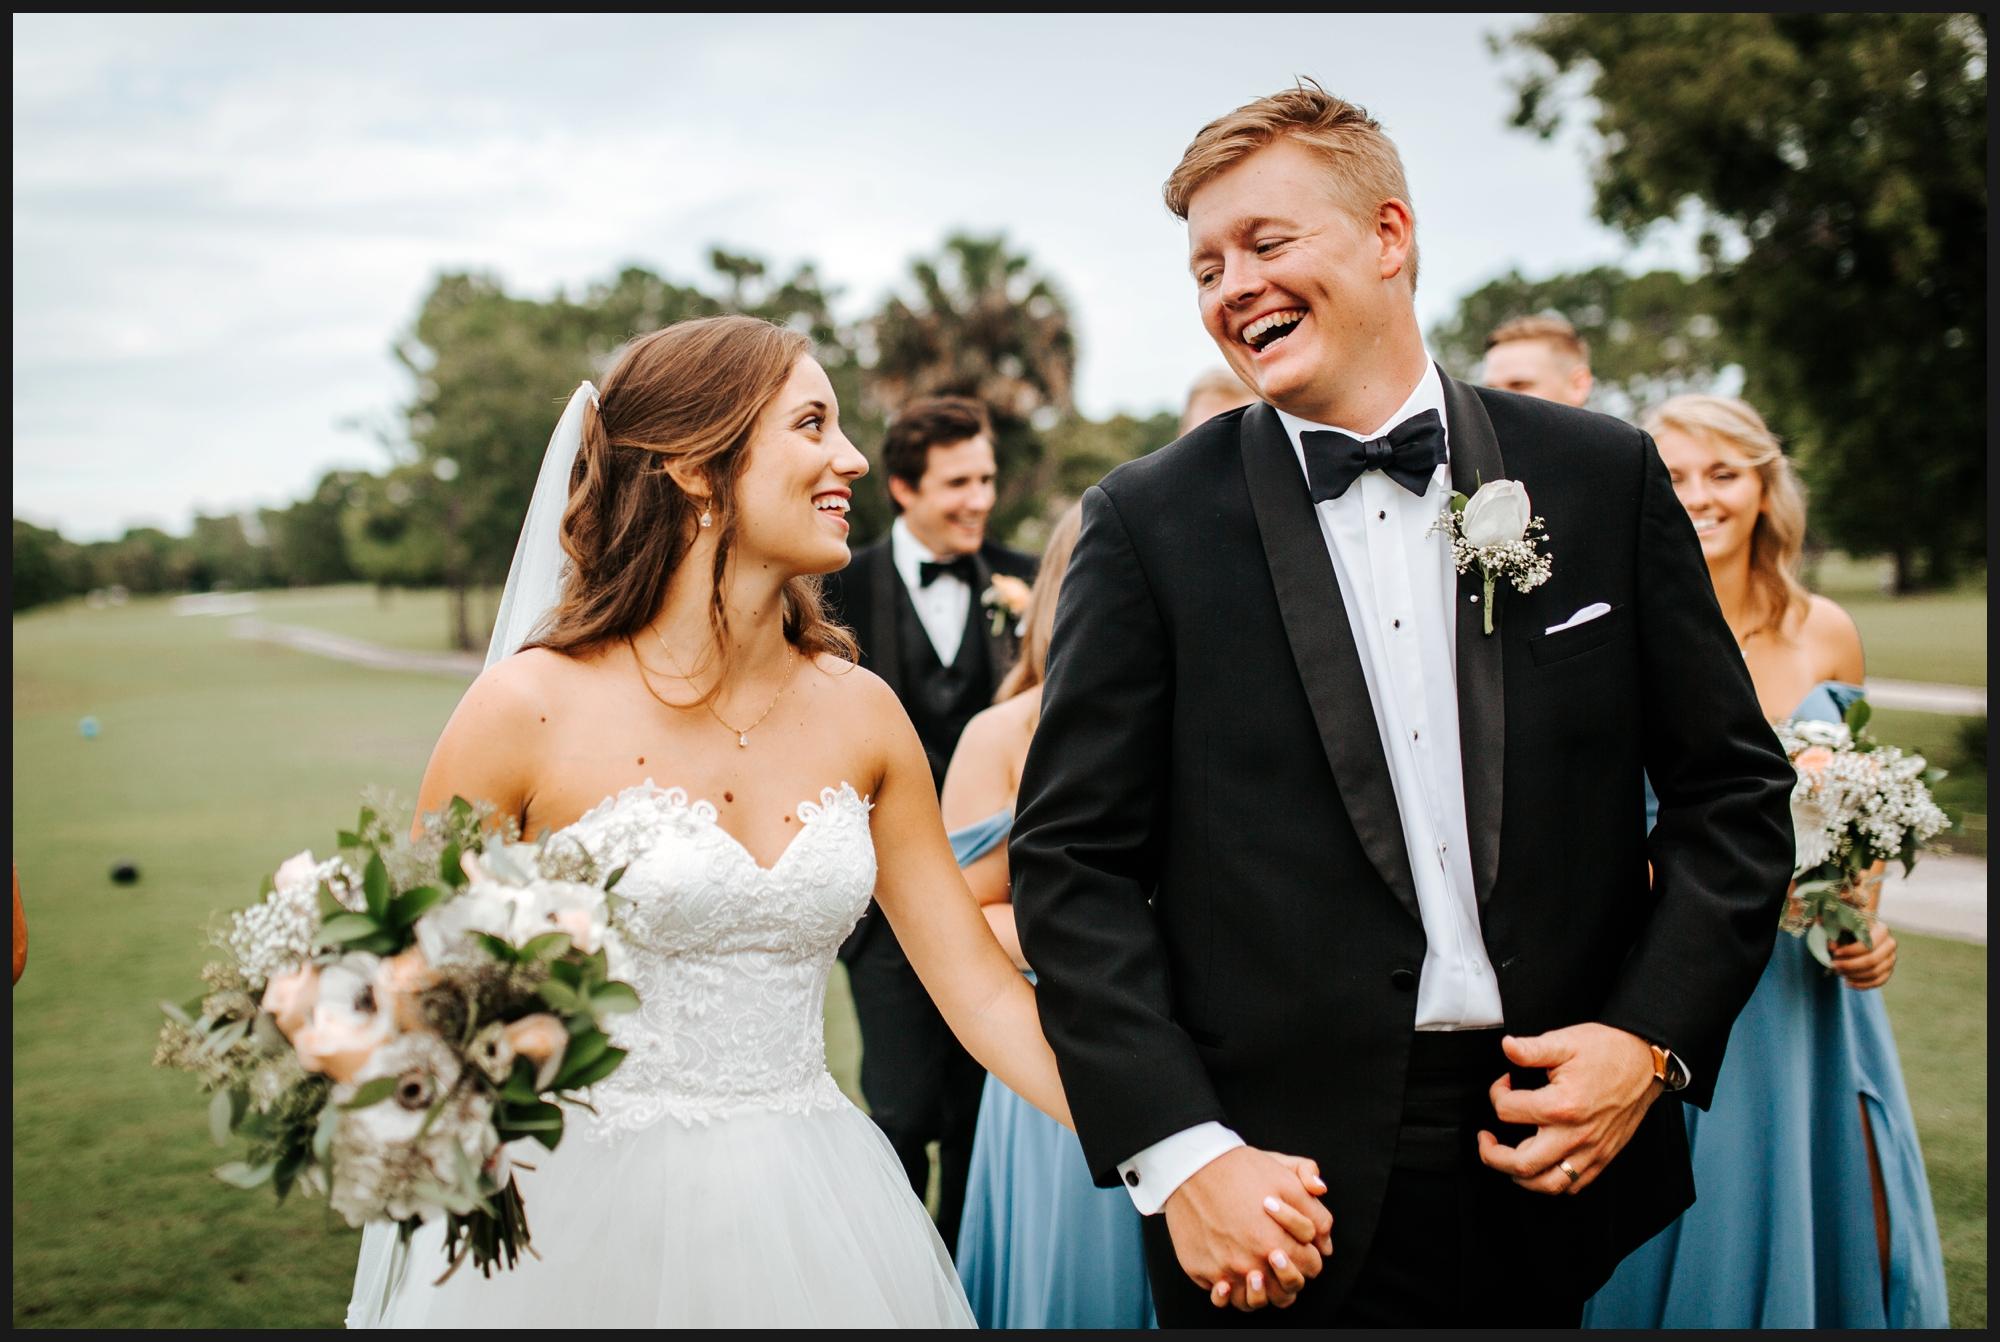 Orlando-Wedding-Photographer-destination-wedding-photographer-florida-wedding-photographer-bohemian-wedding-photographer_0067.jpg